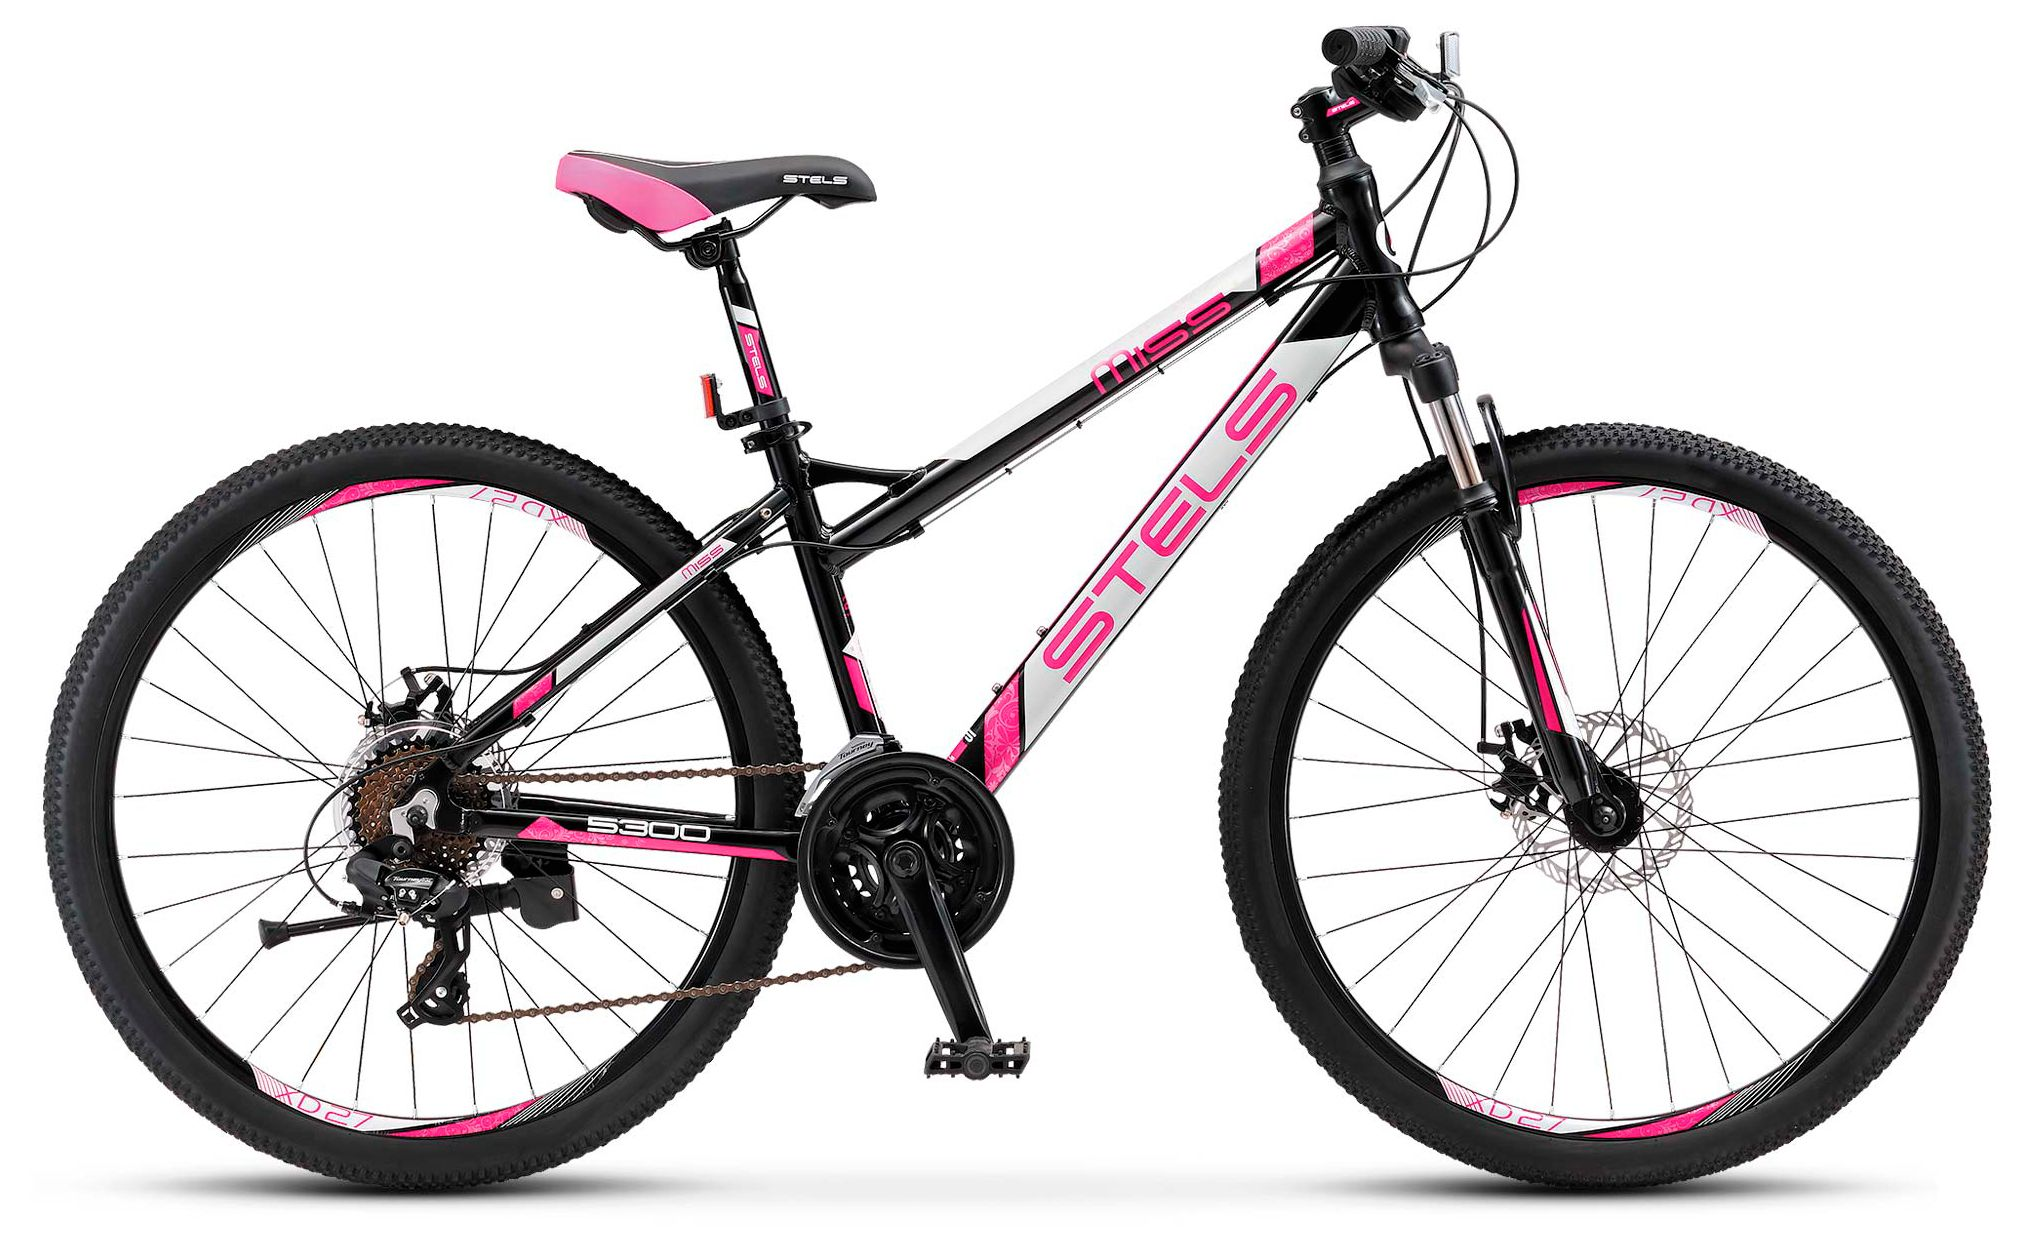 Велосипед Stels Miss 5300 MD (V030) 2017 miss 6700 md 26 16